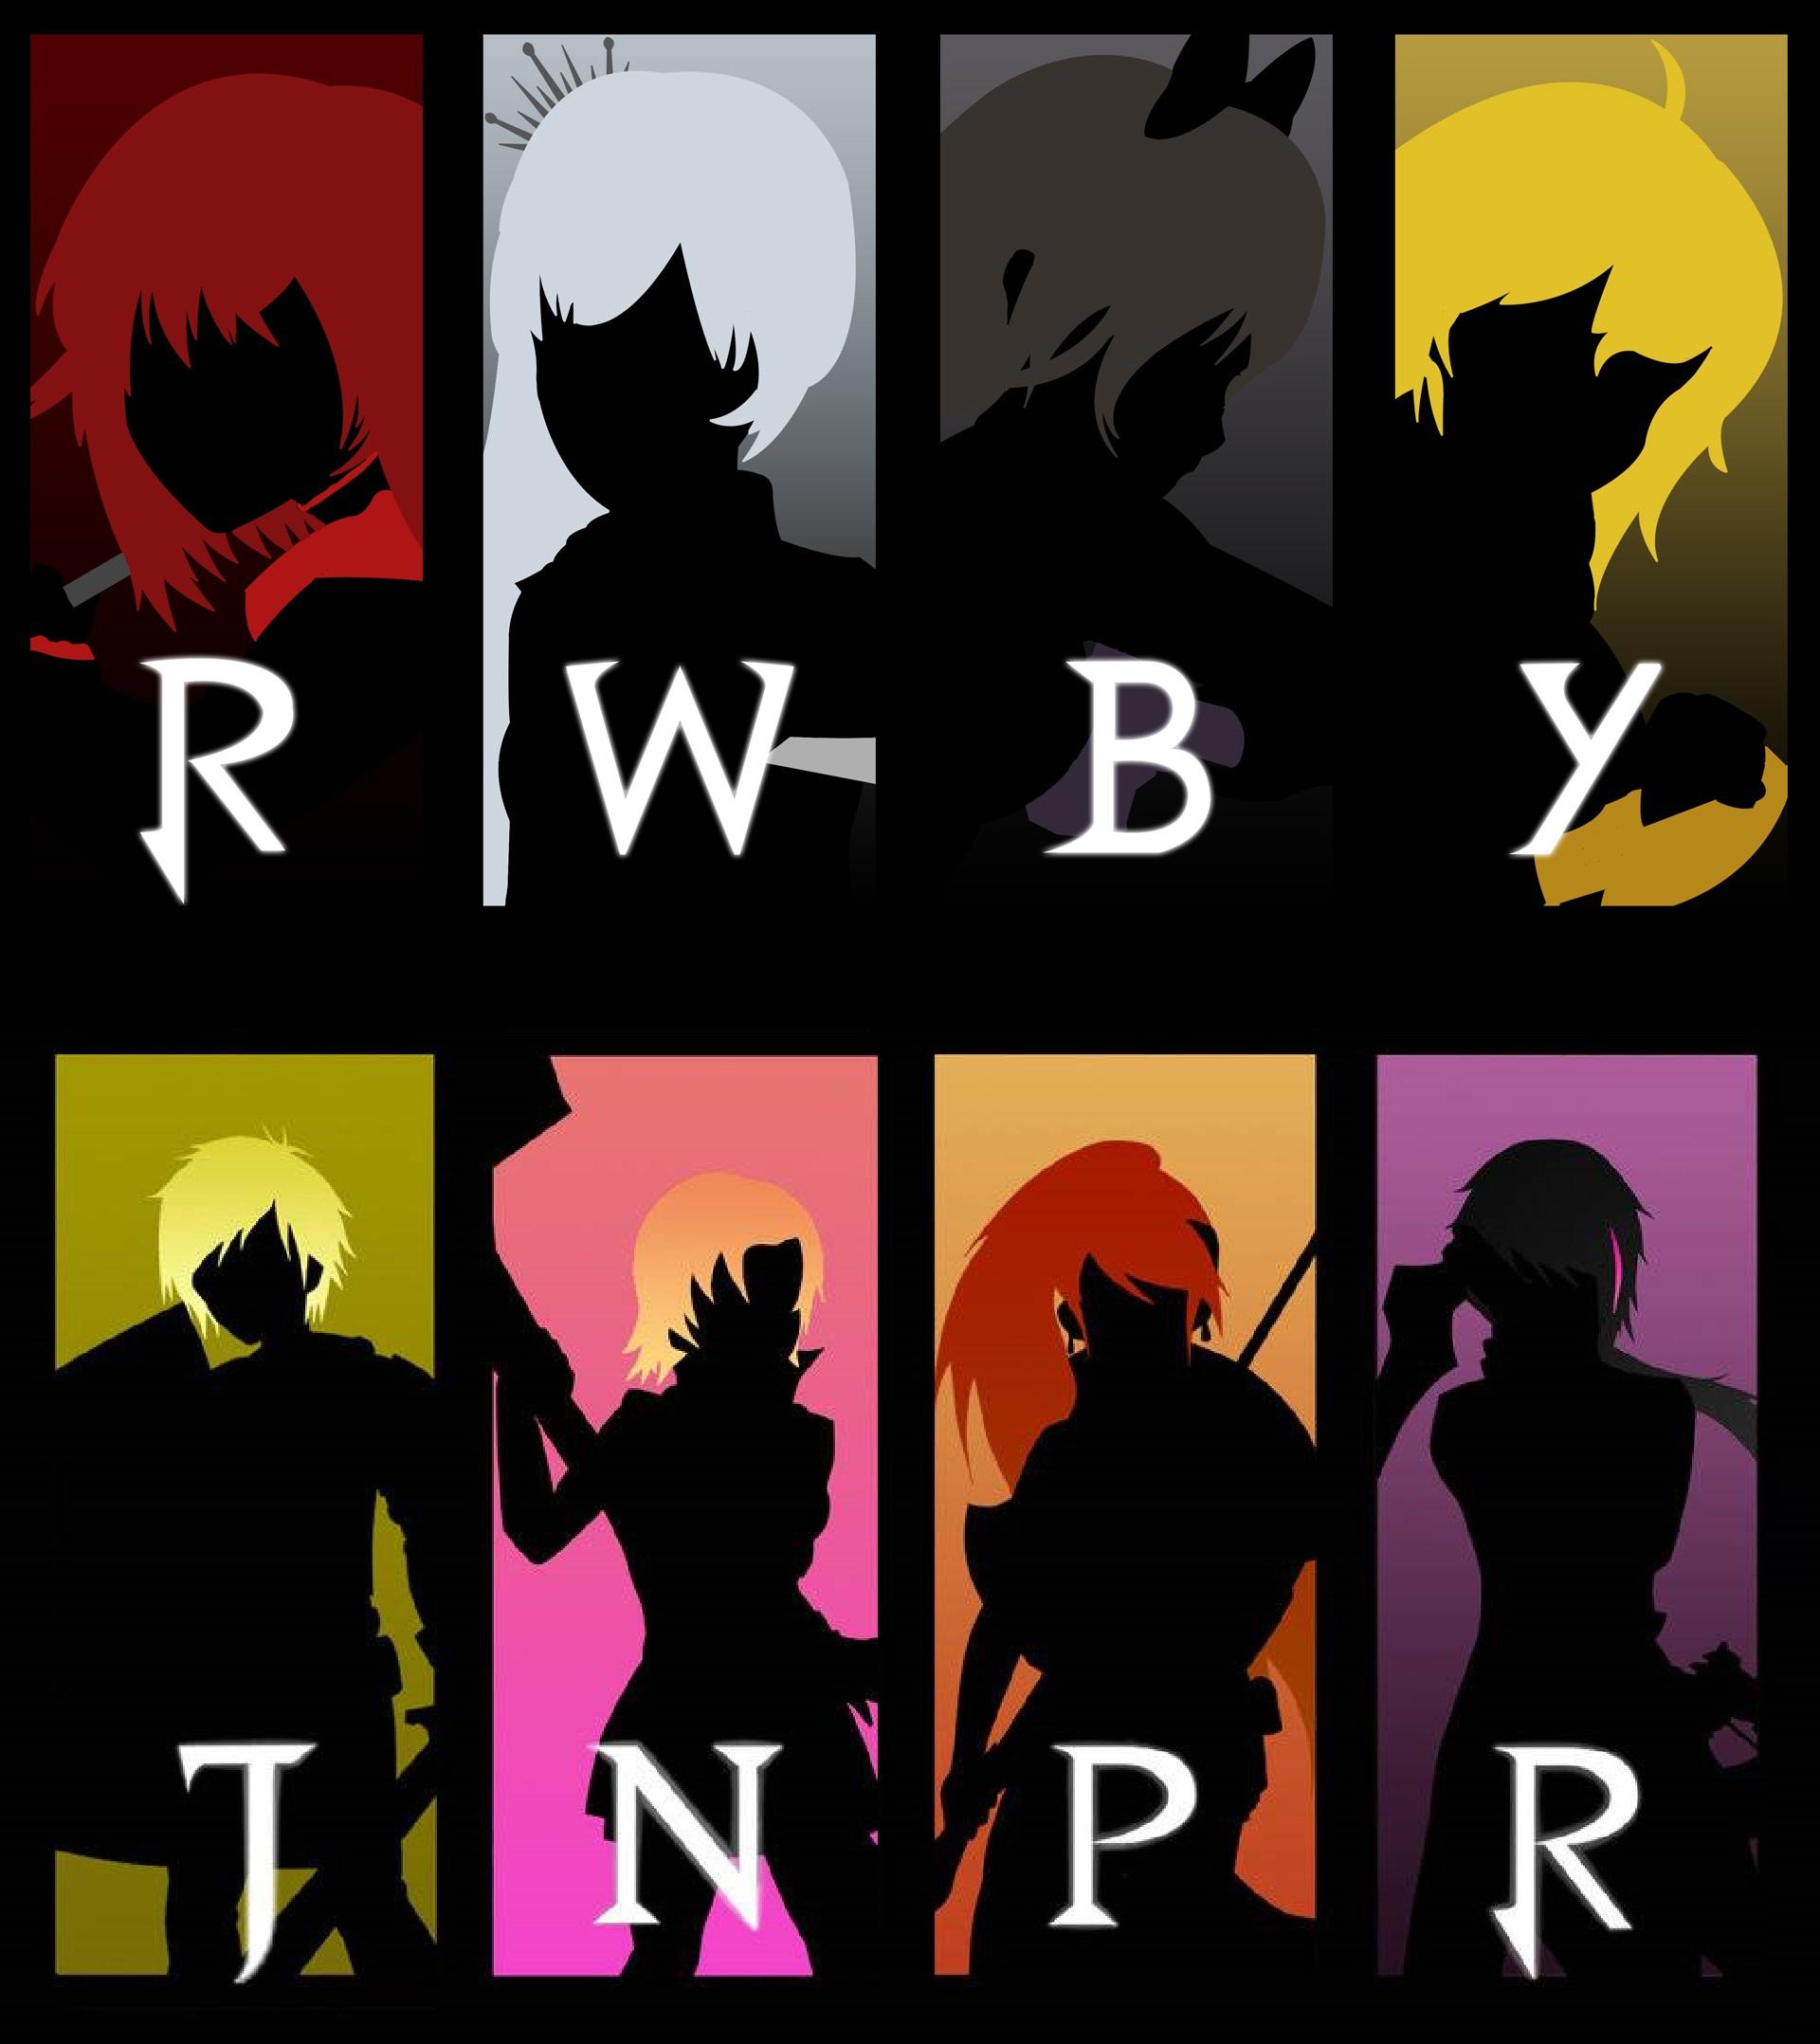 rwby wallpaper jnpr - photo #3